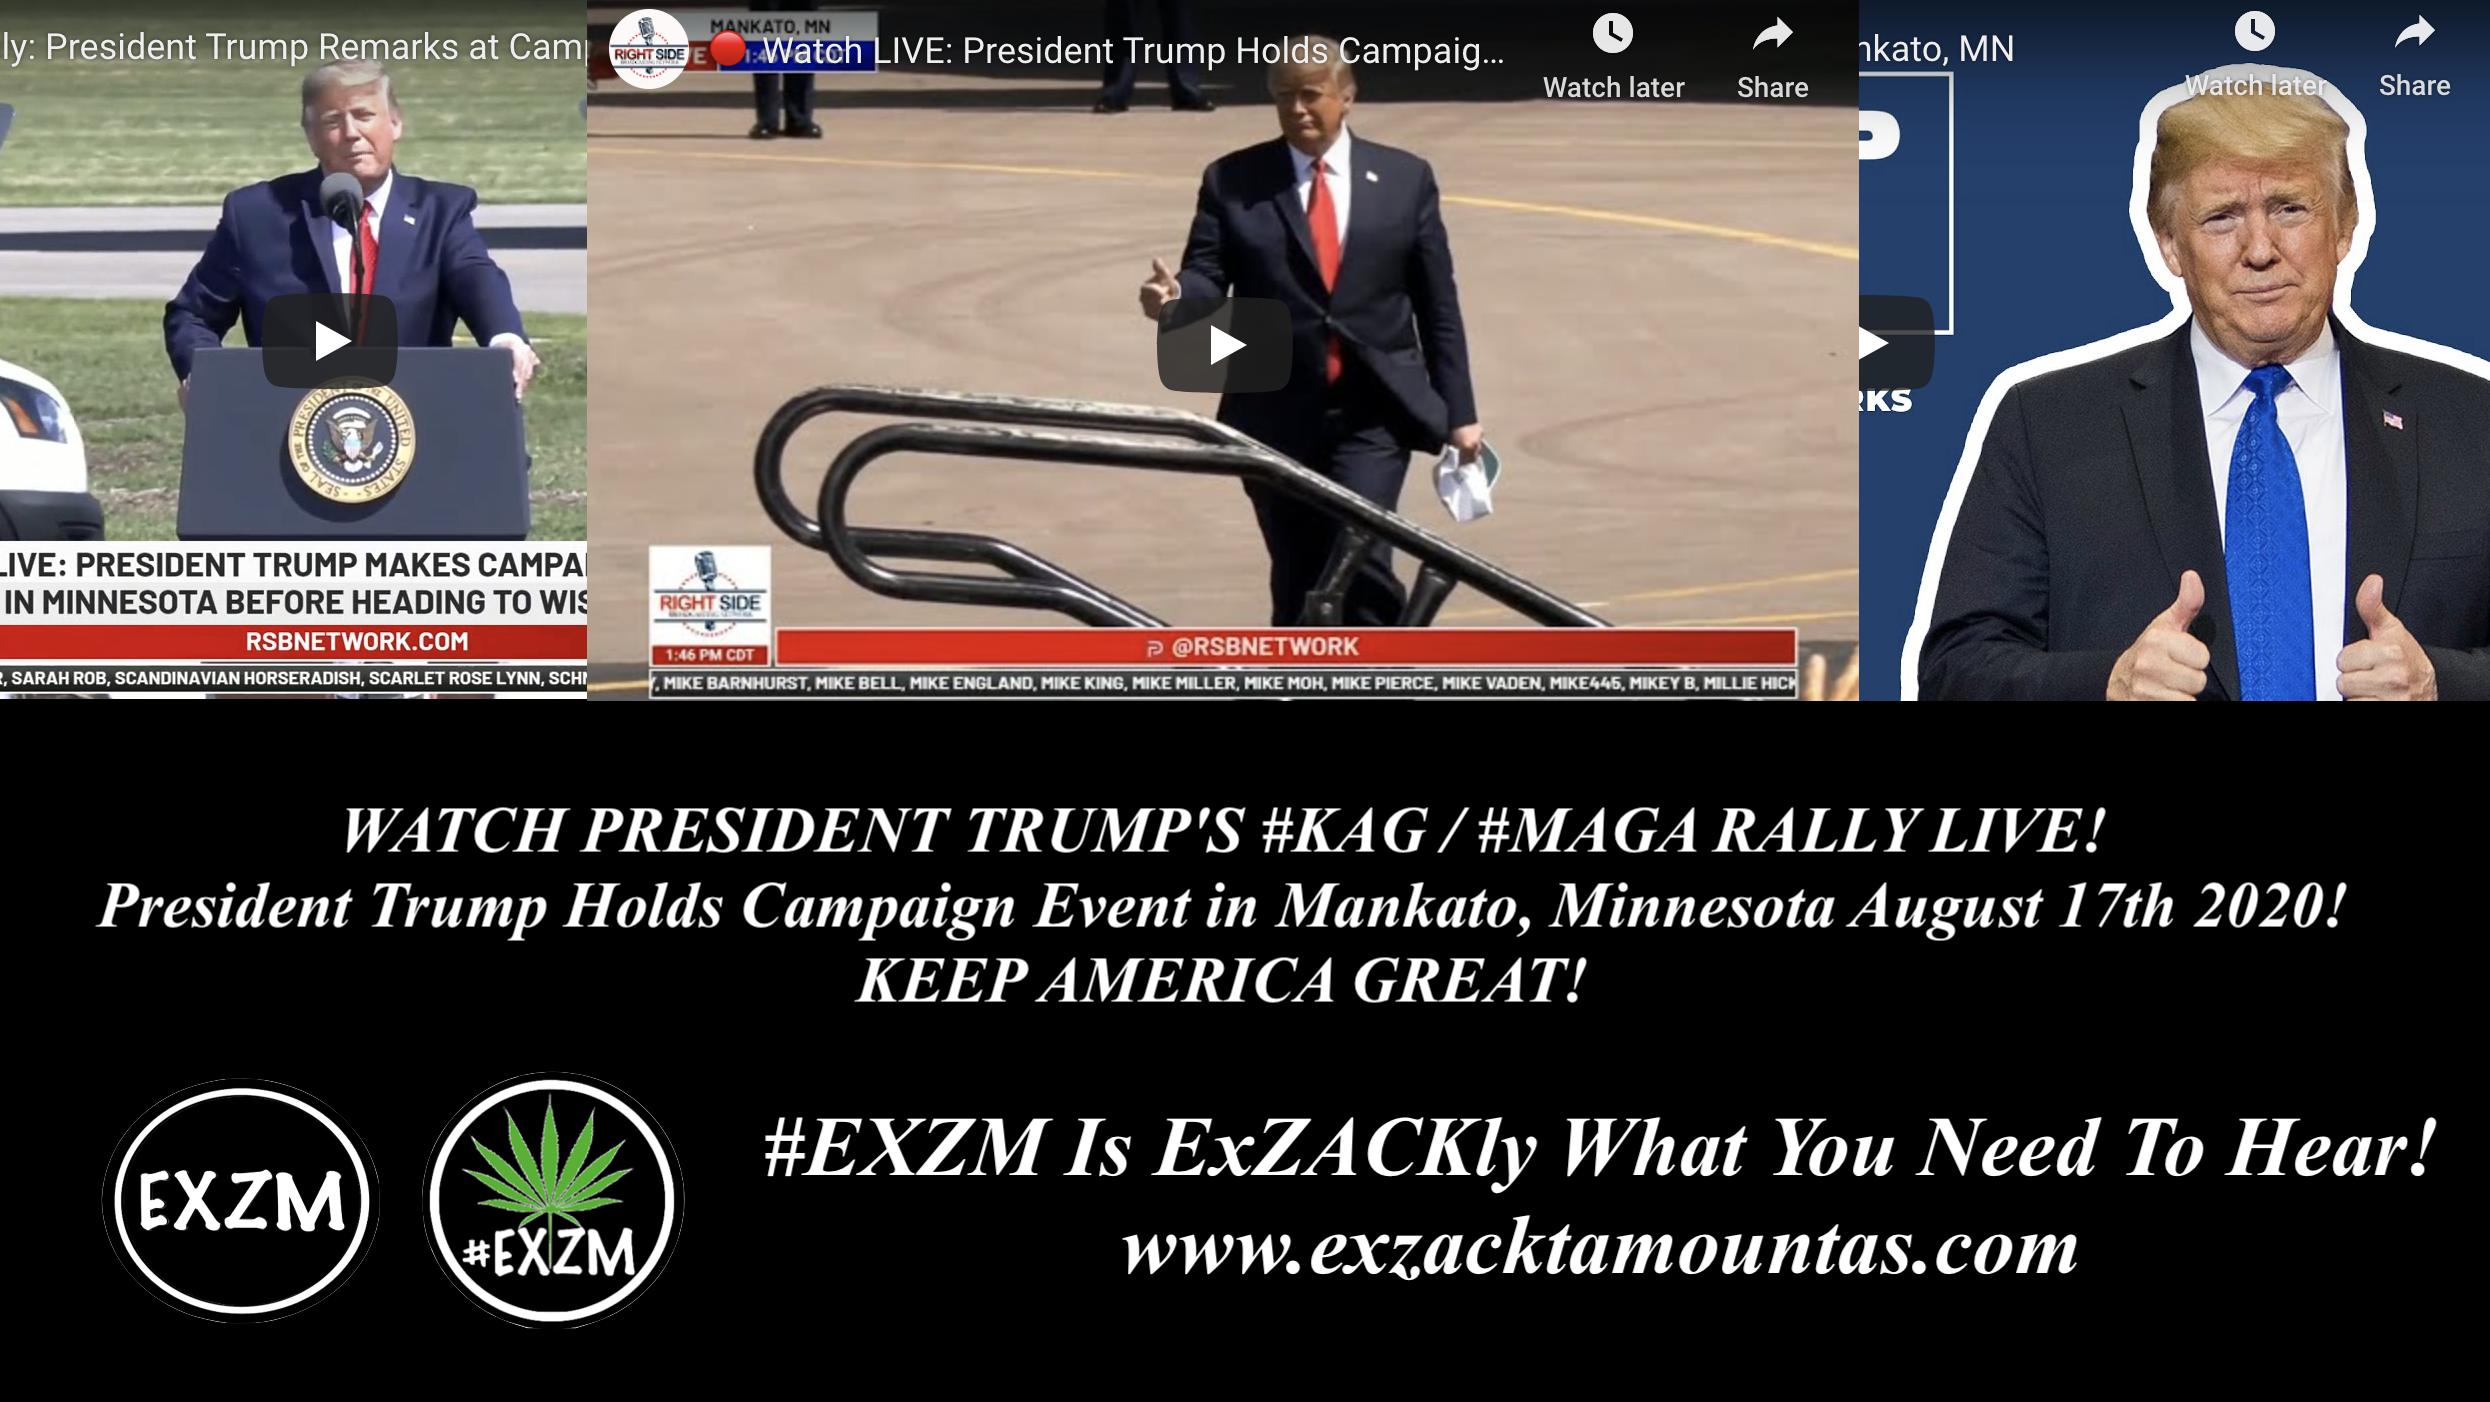 President Donald Trump KAG MAGA Rally Mankato Minnesota August 17th 2020